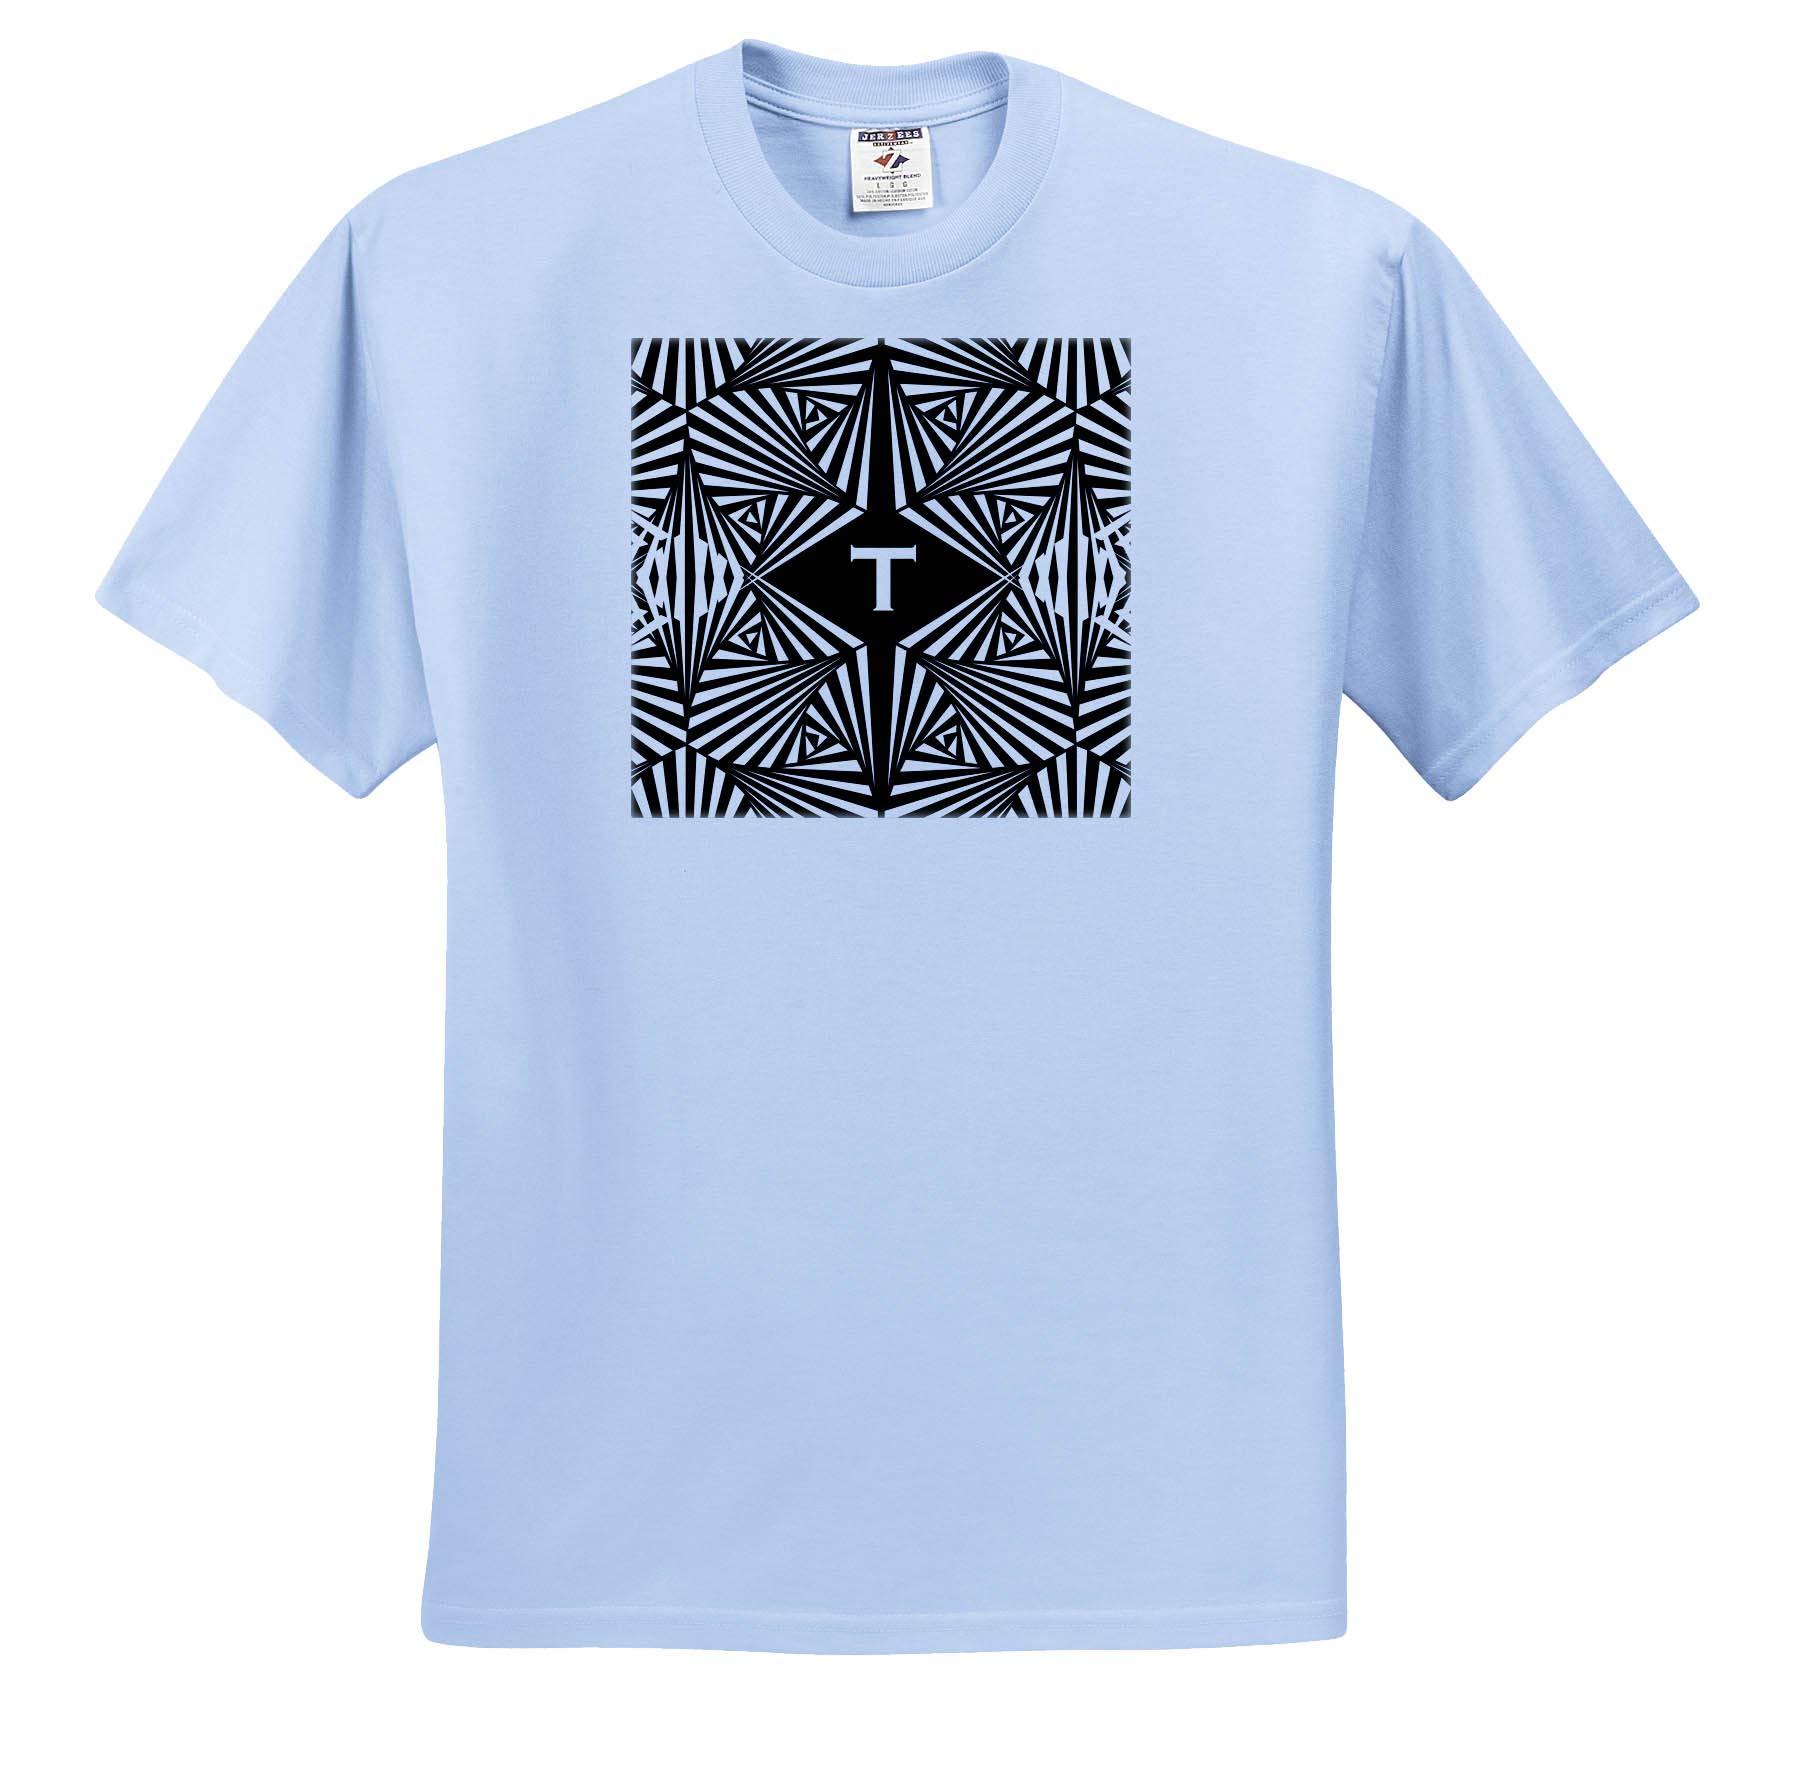 Russ Billington Monograms Geometric Letter T Letter T And Geometric Monogram T Shirts 2592